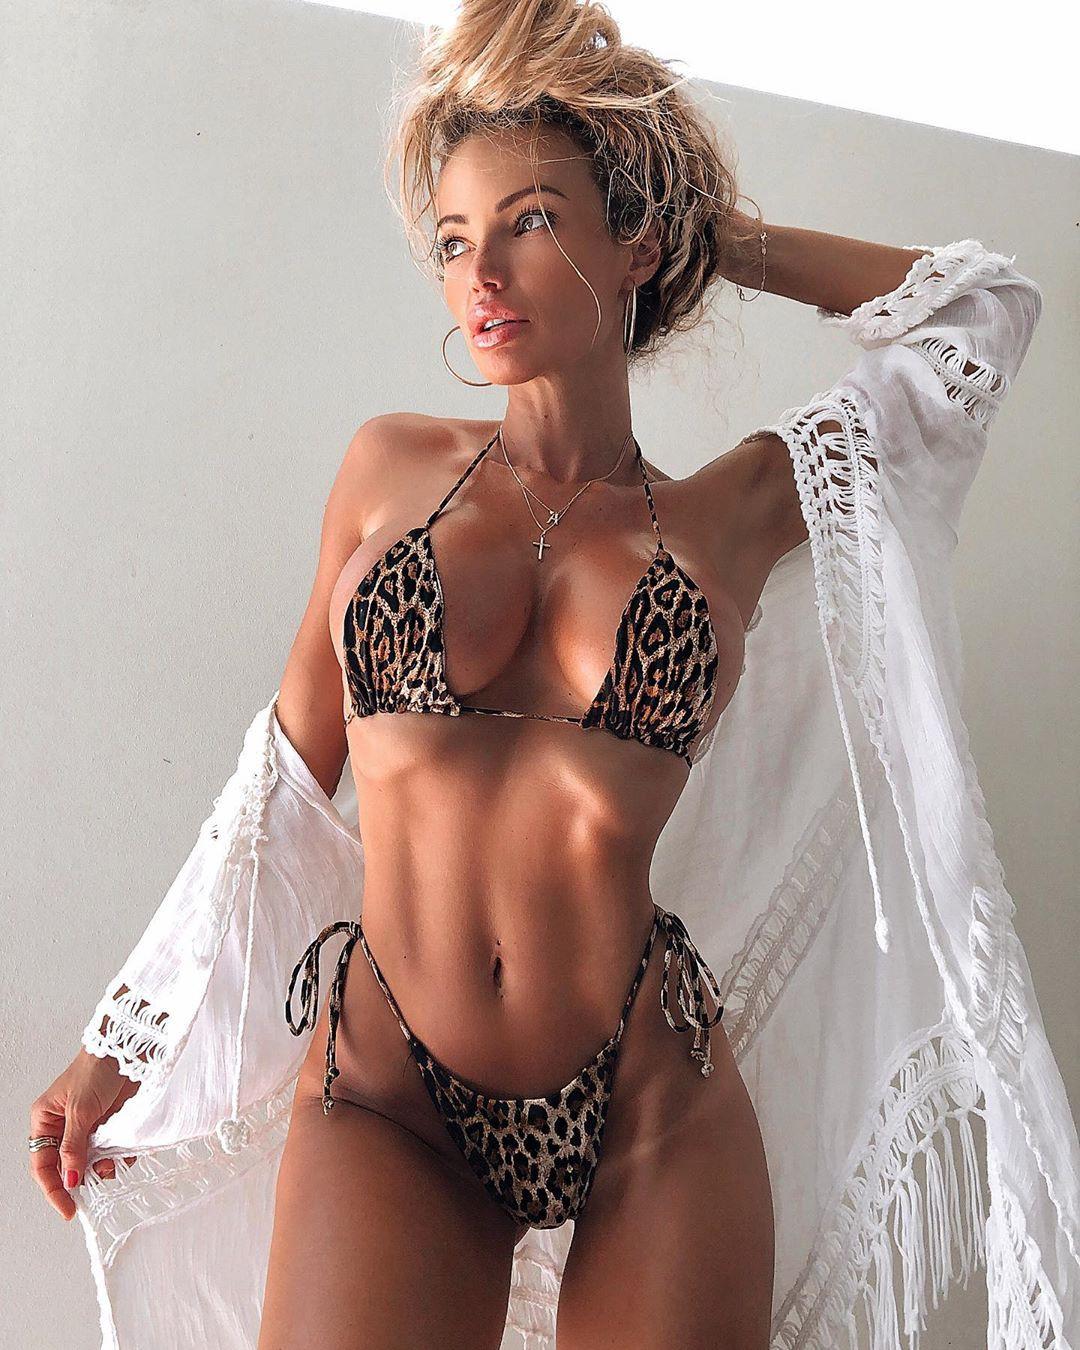 Abby Dowse lingerie, bikini outfits for women, hot girls thighs